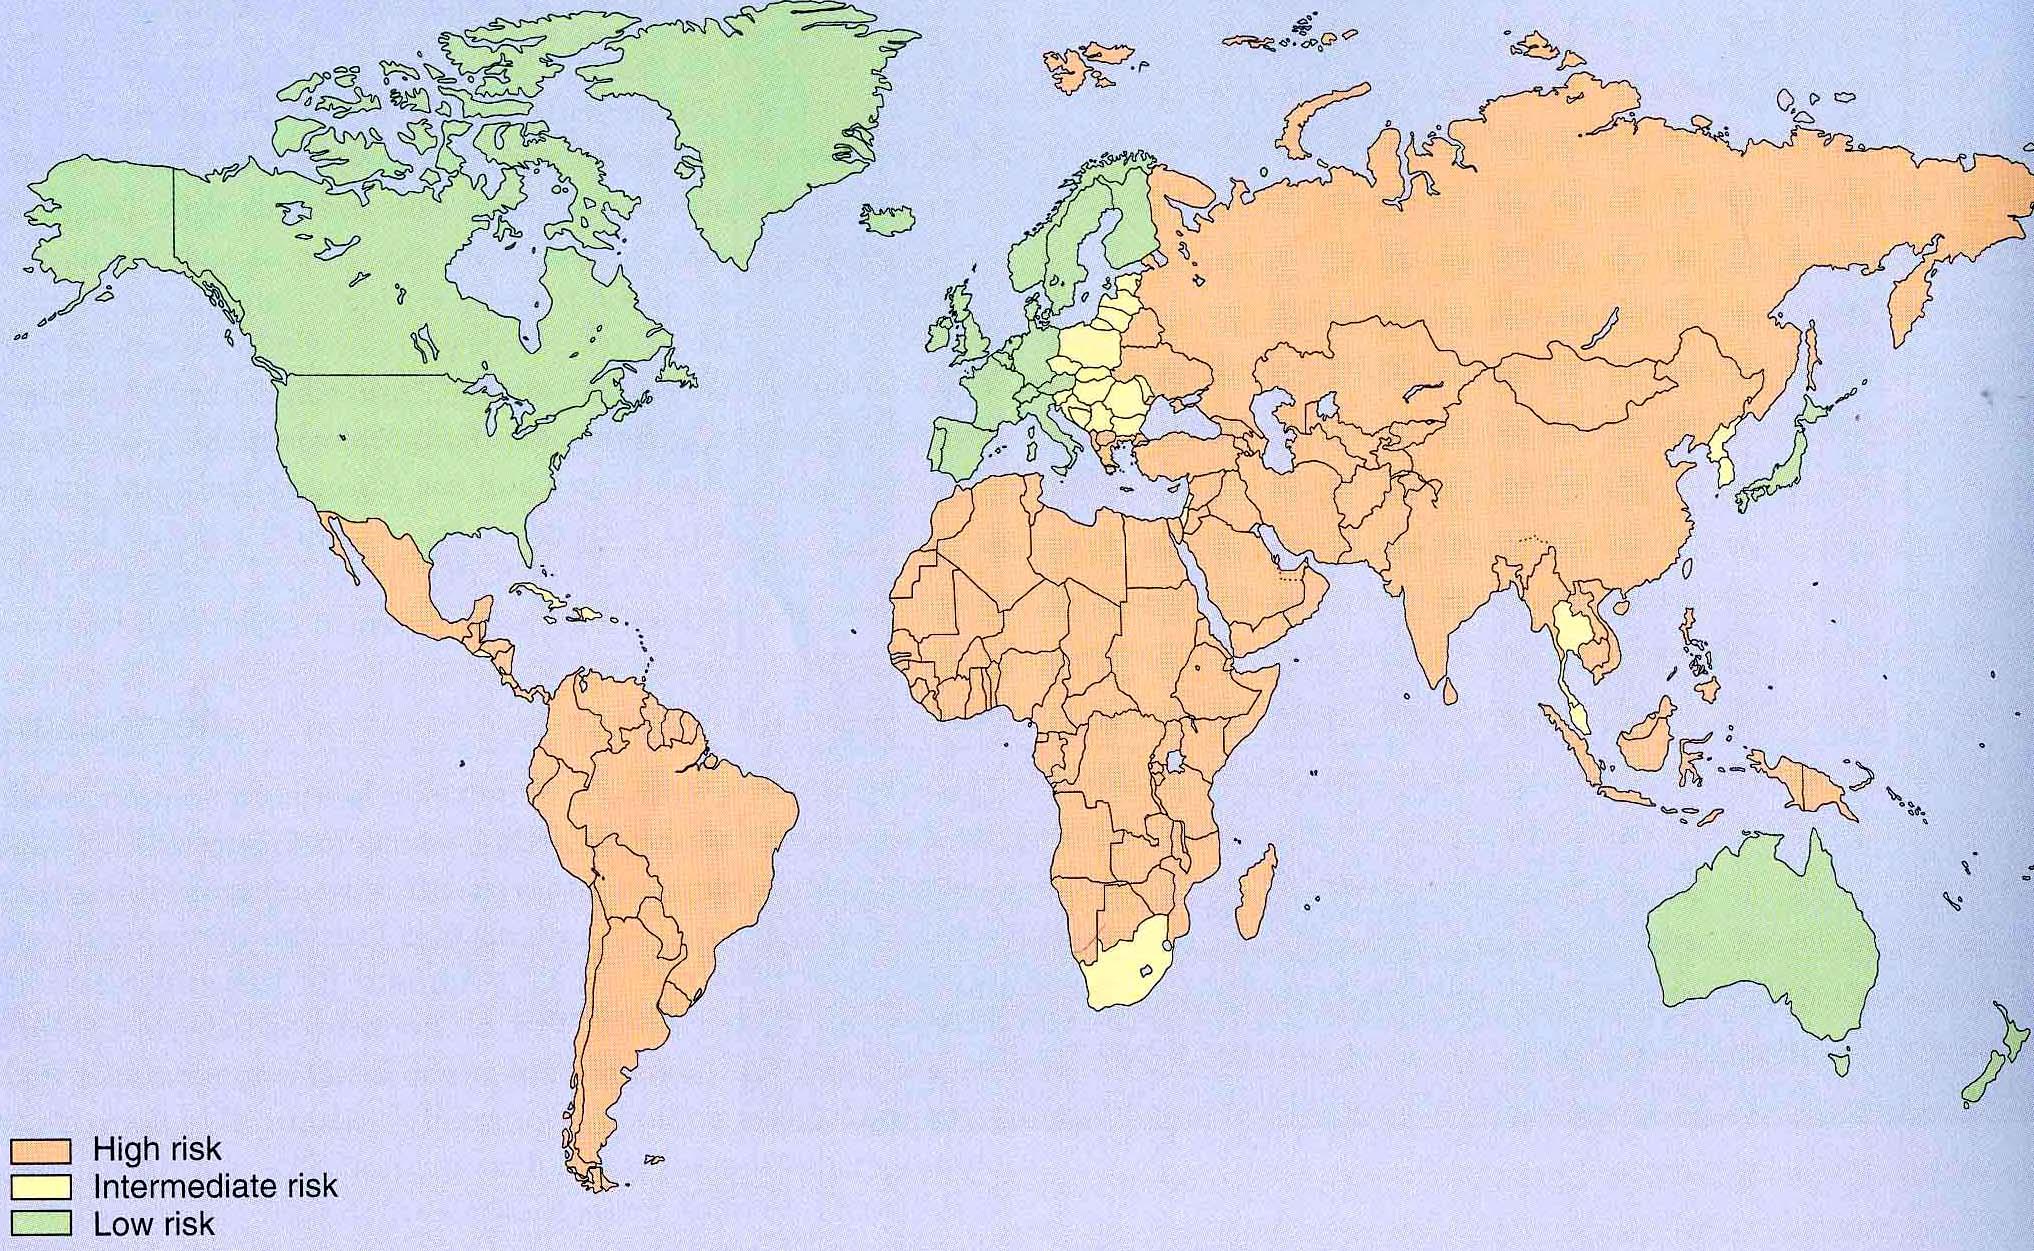 Diarrhoeal risk map